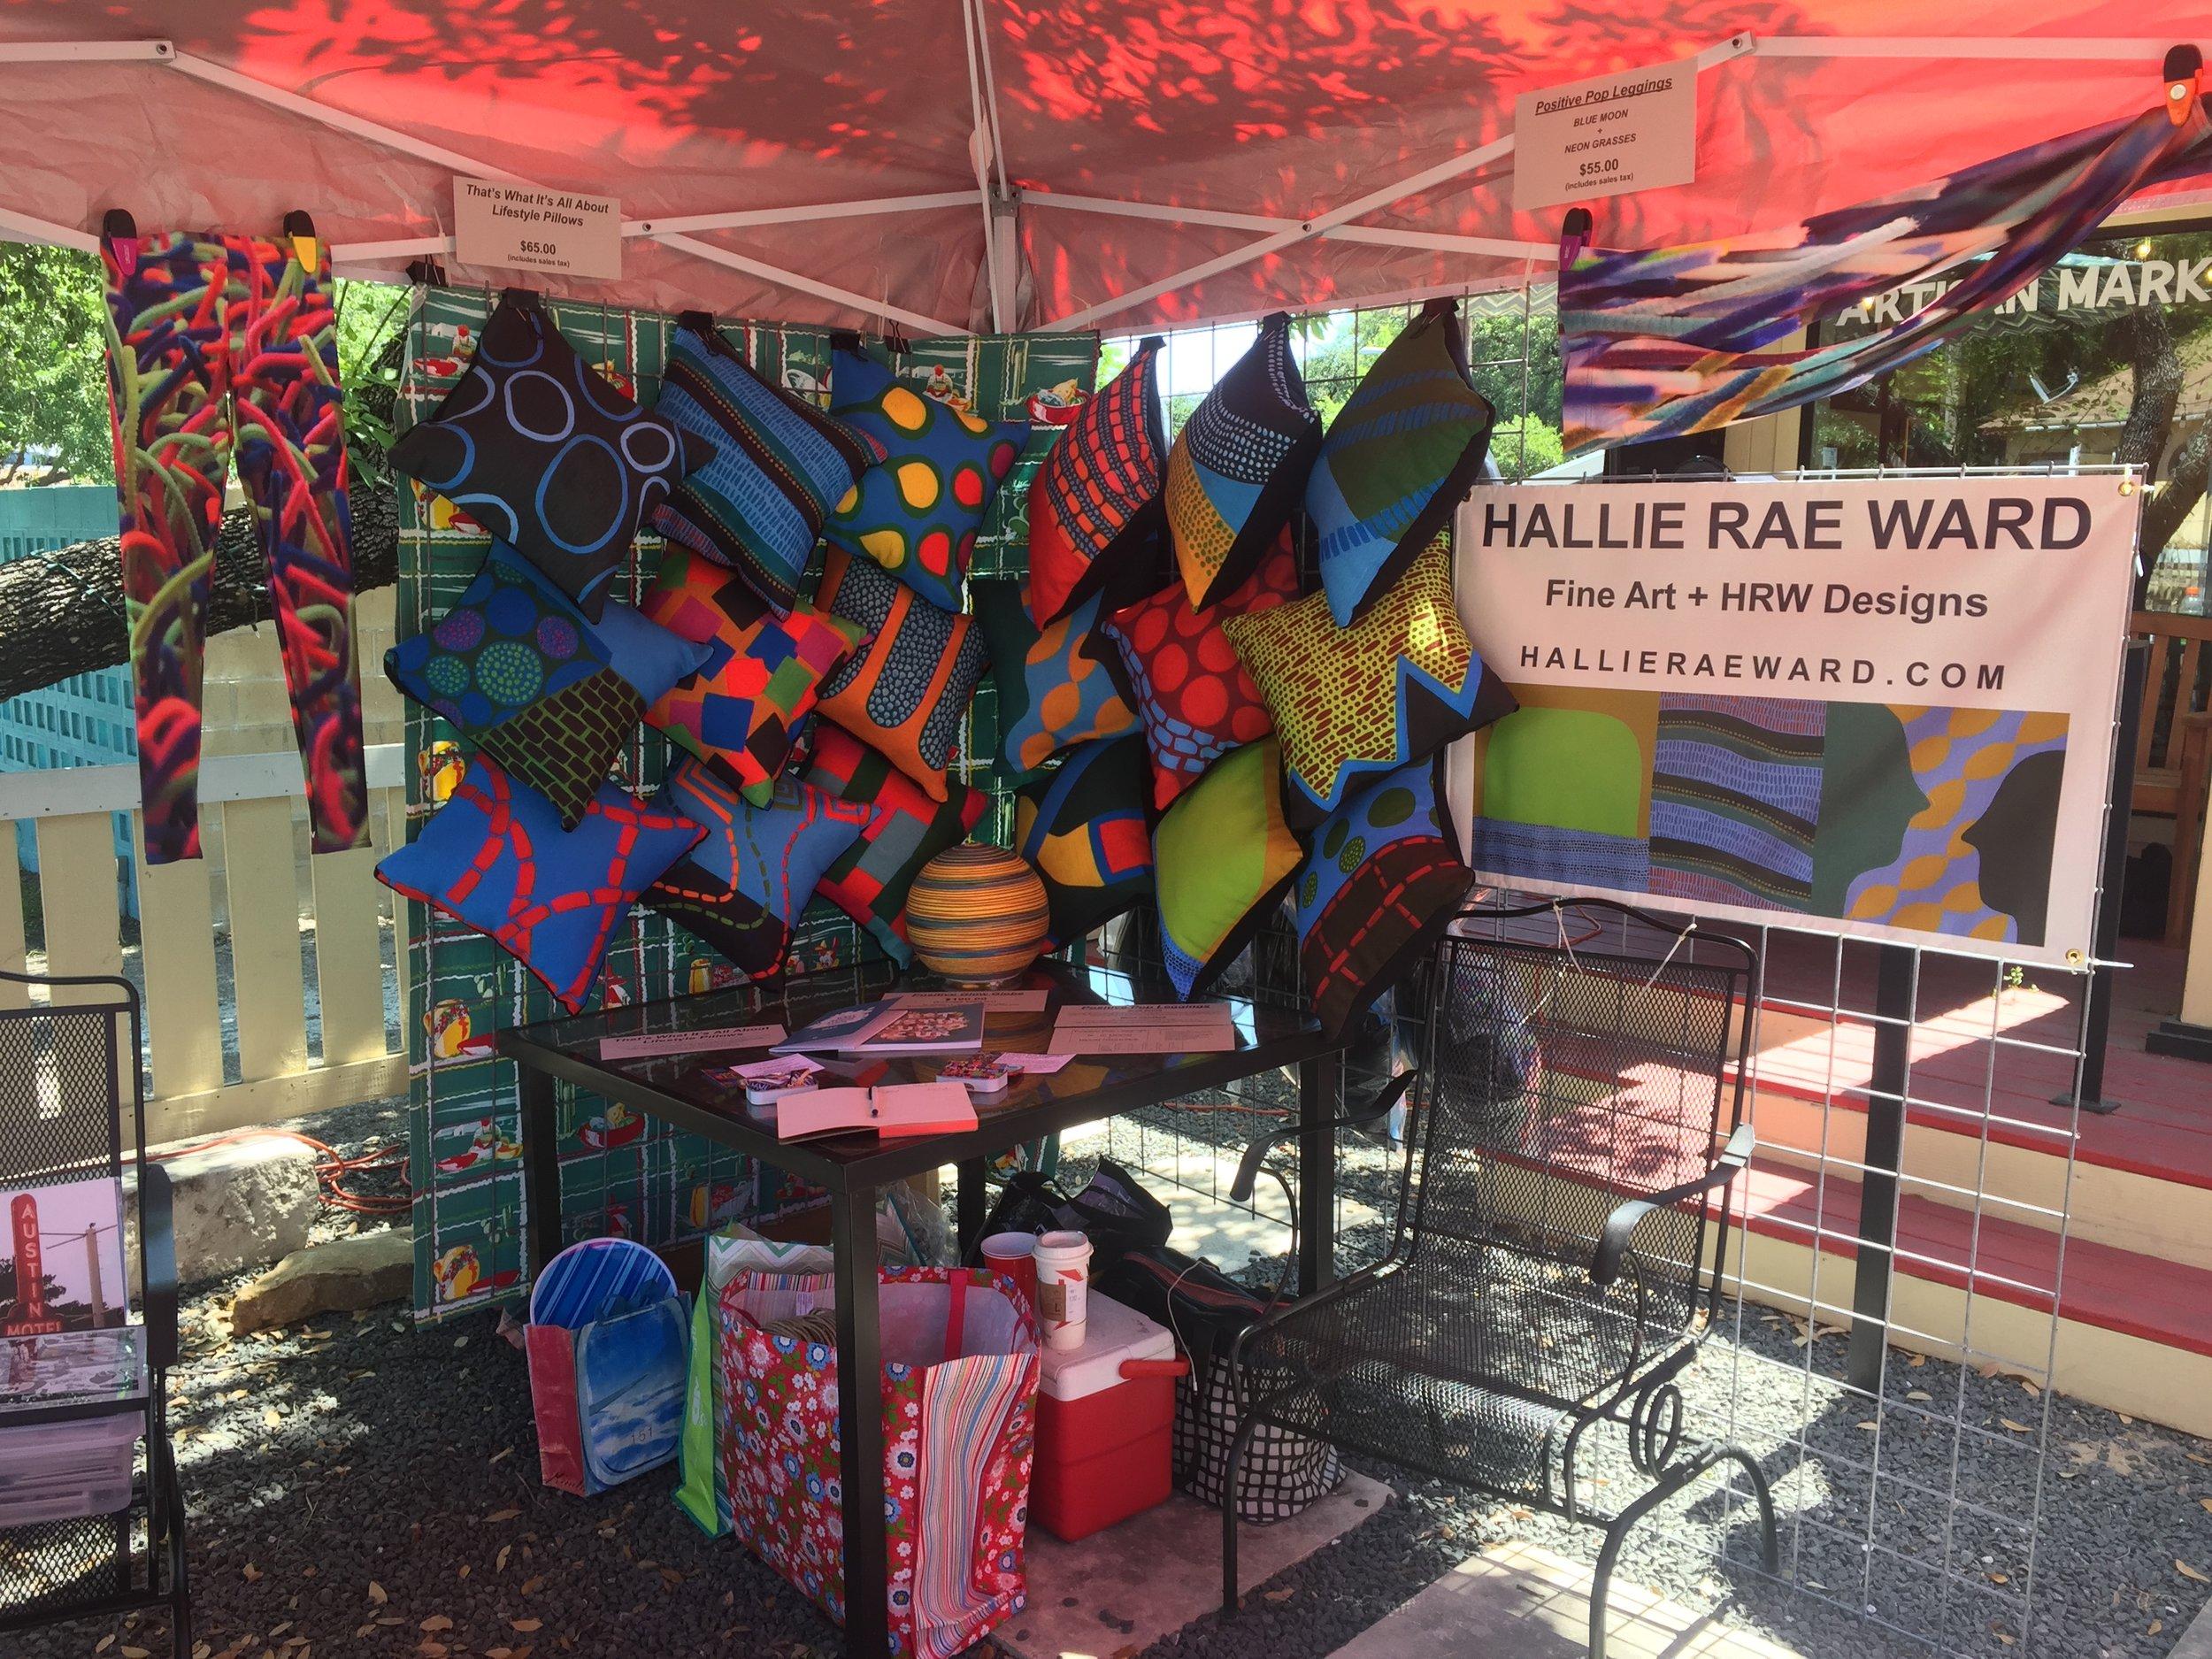 WEST 2017 Hallie rae Ward (1).JPG